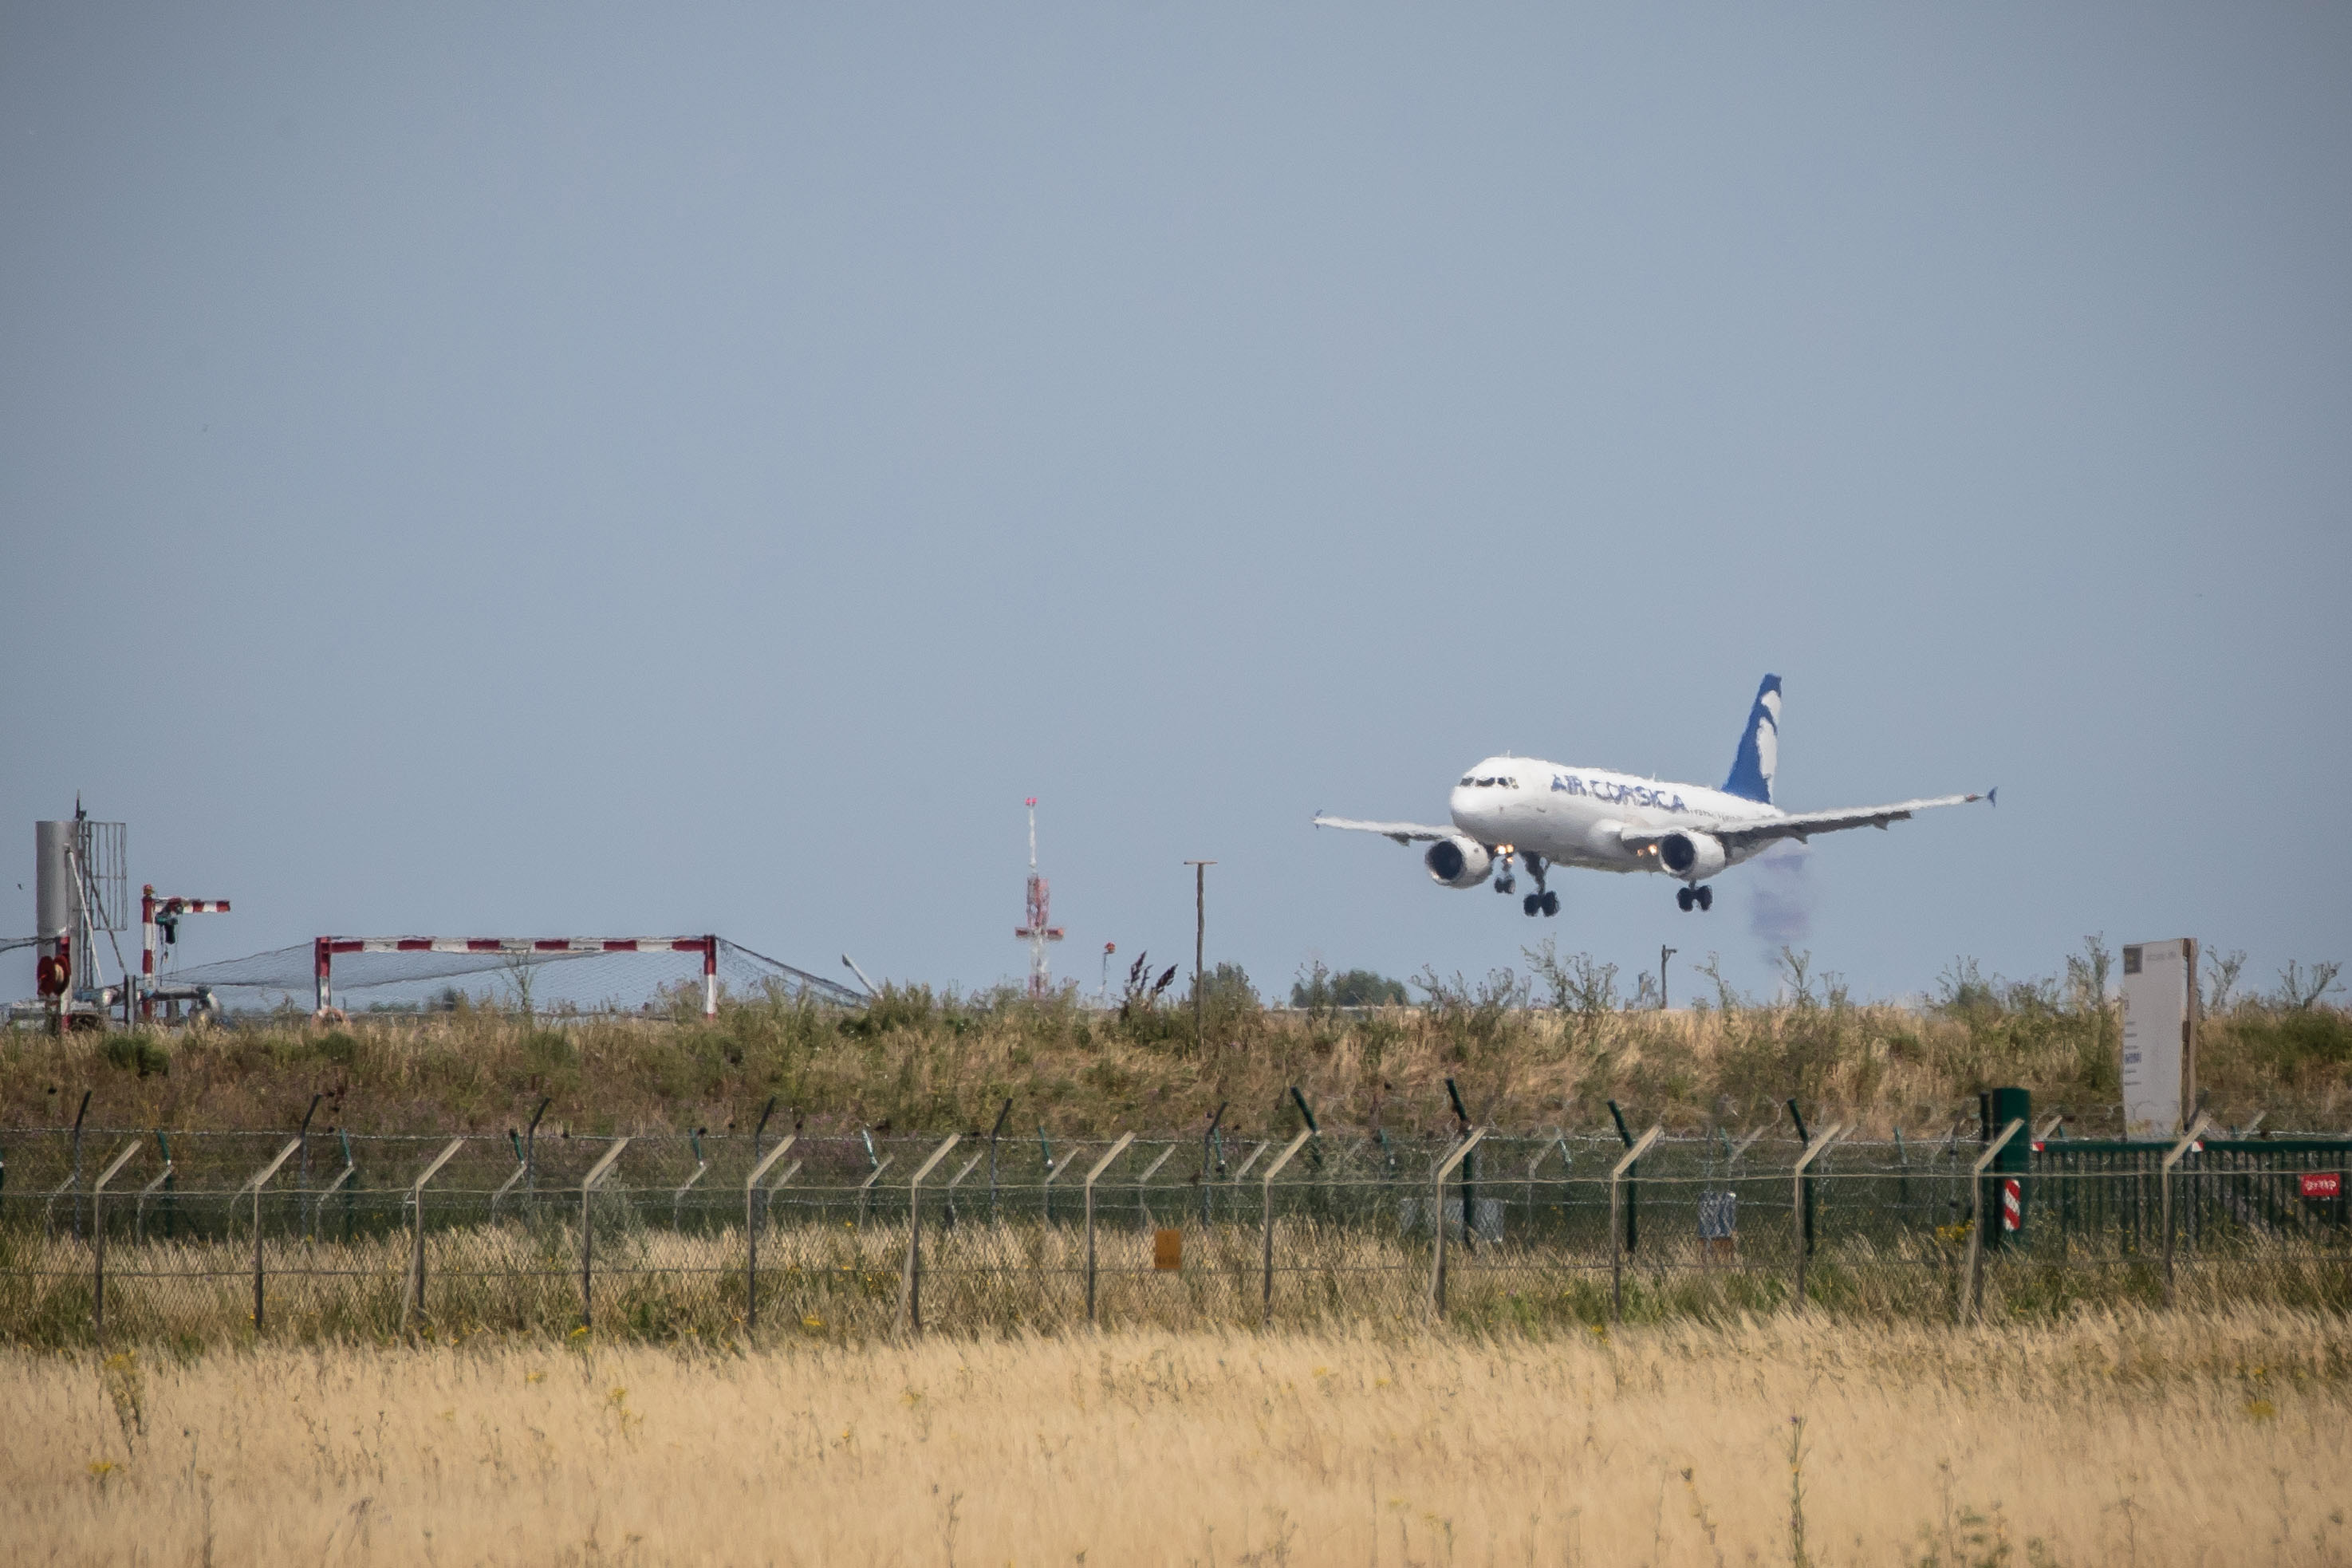 An Air Corsica aircraft lands at Paris Orly Airport near Paris on June 26.